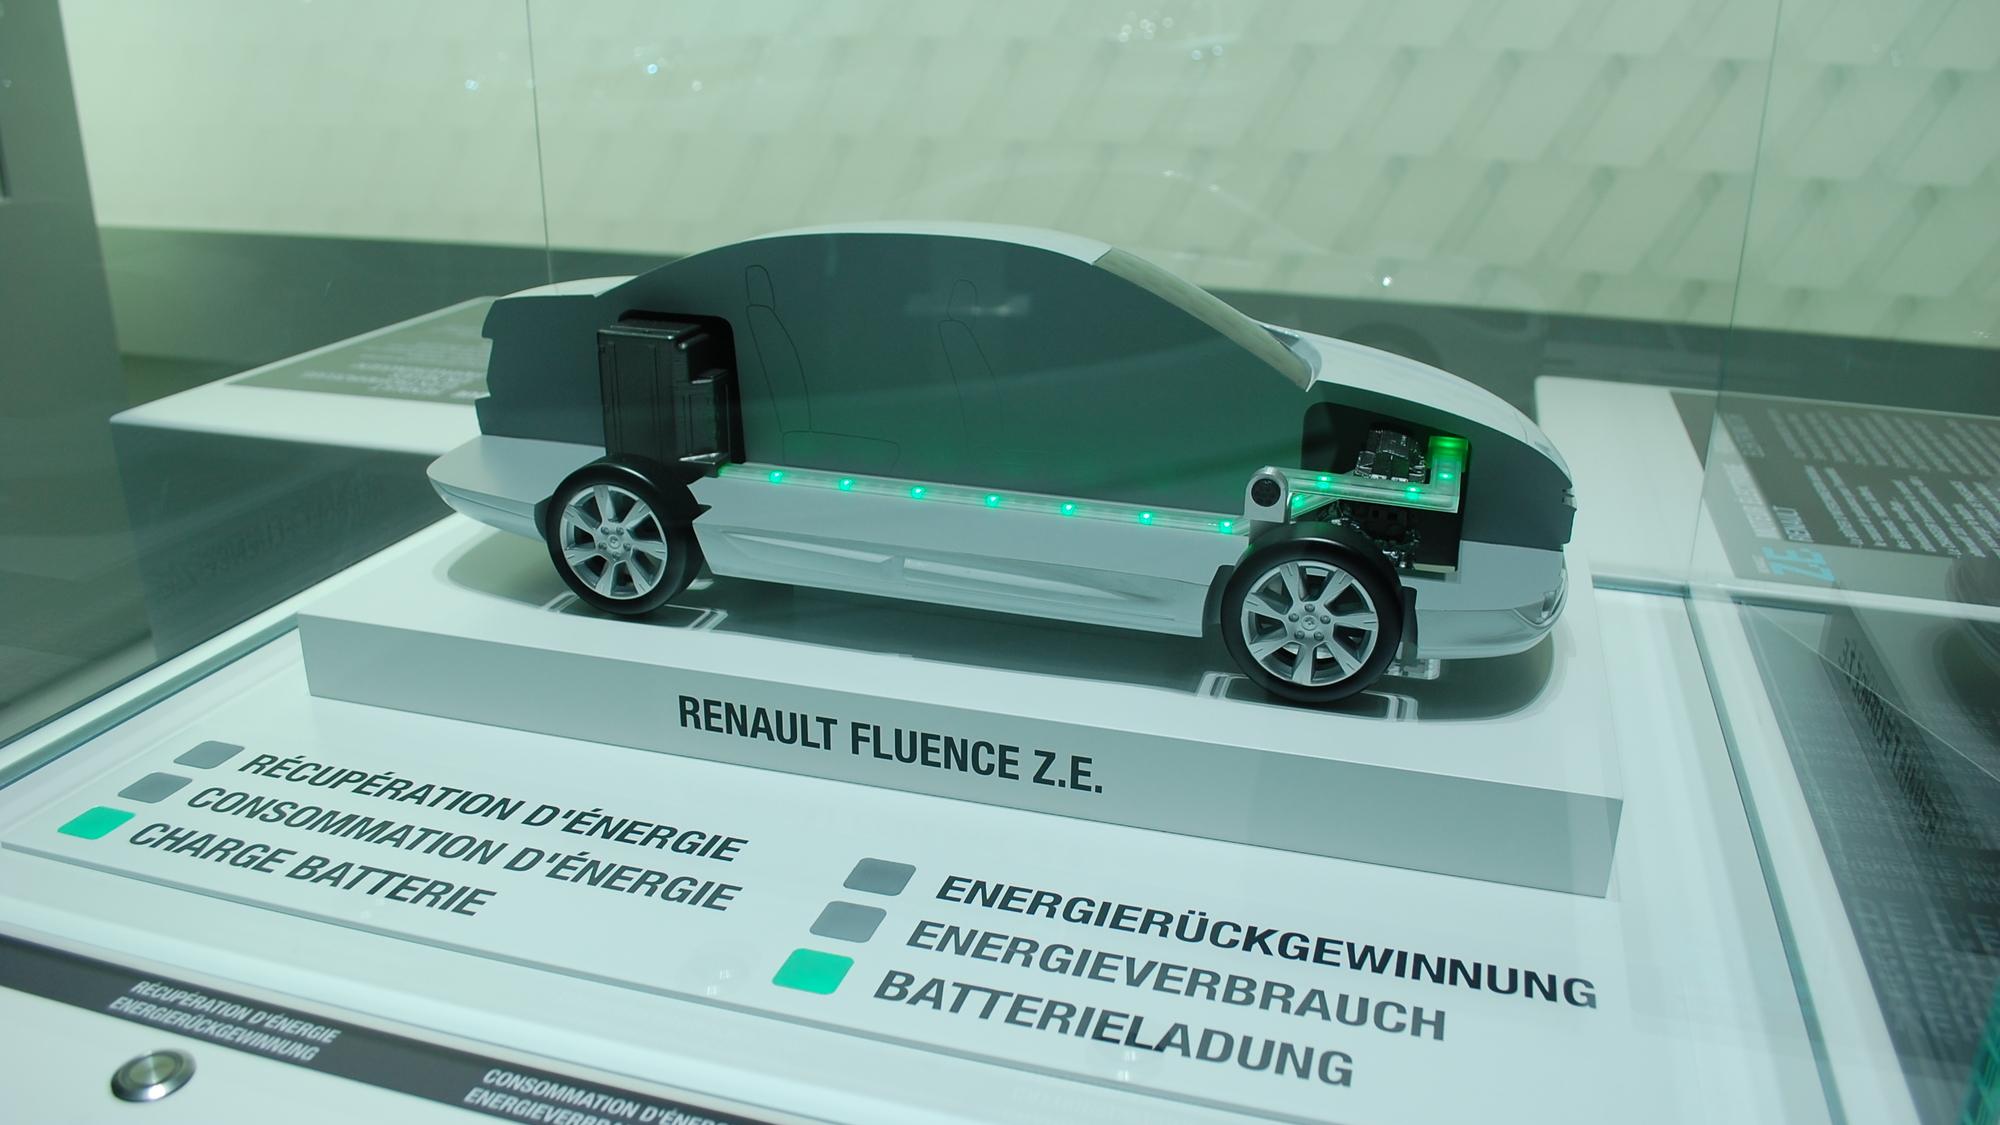 2012 Renault Fluence Z.E.